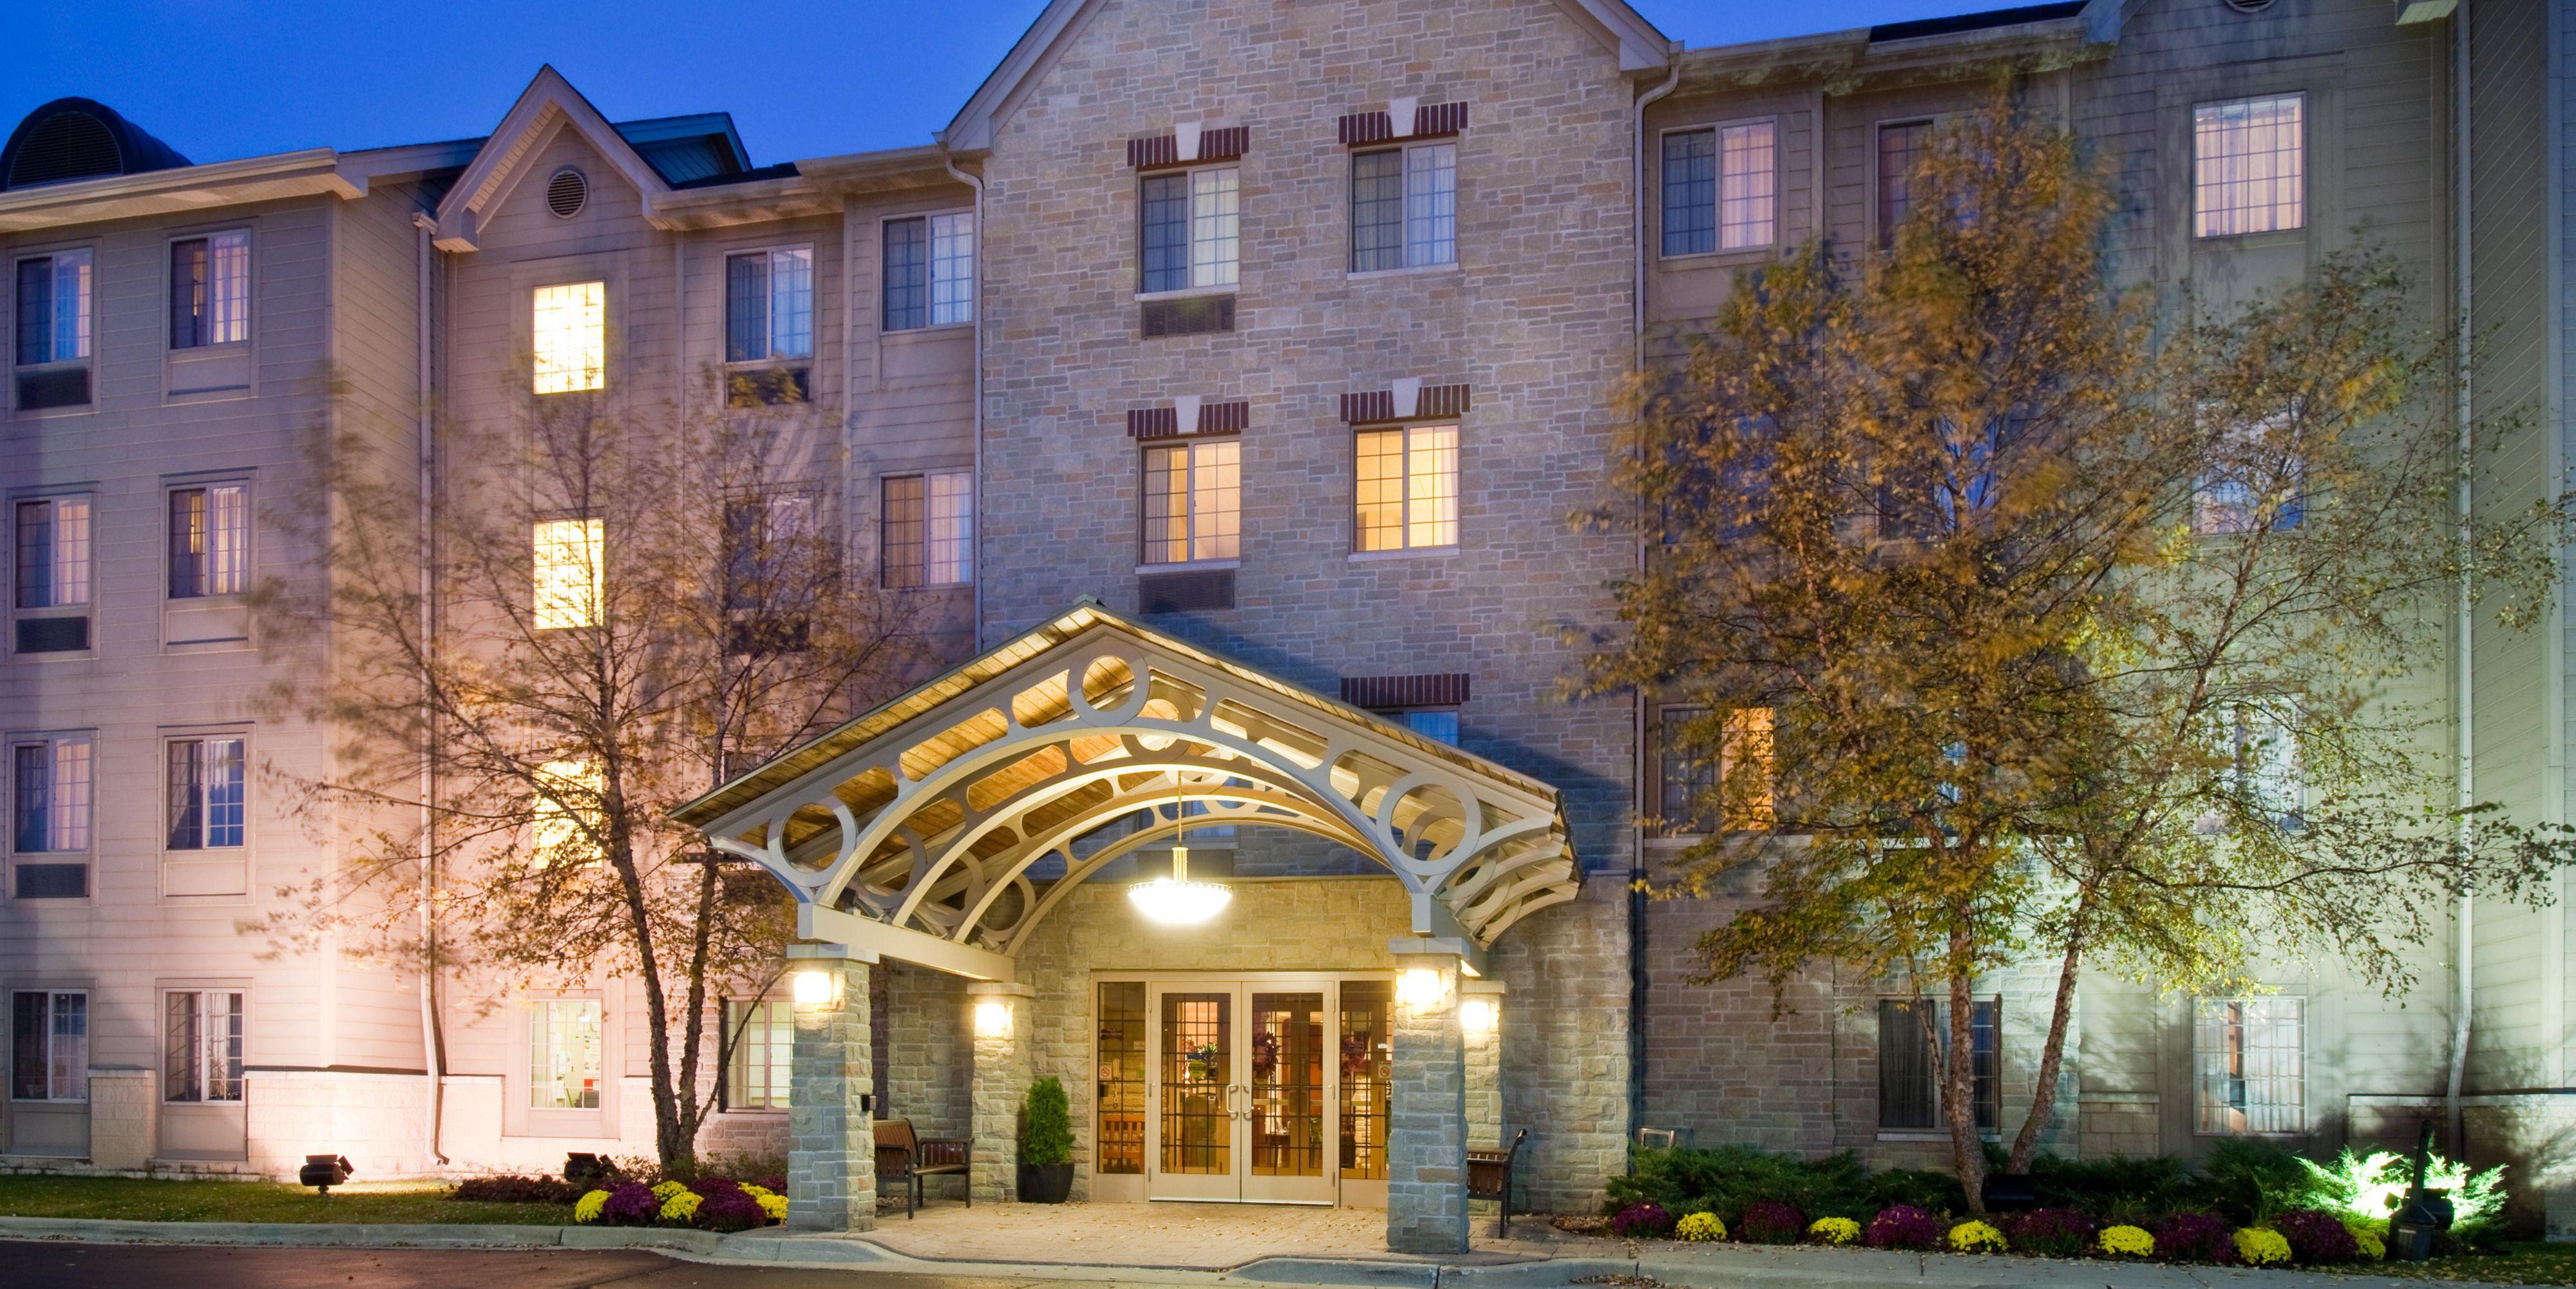 Staybridge Suites Chicago-Oakbrook Terrace image 0